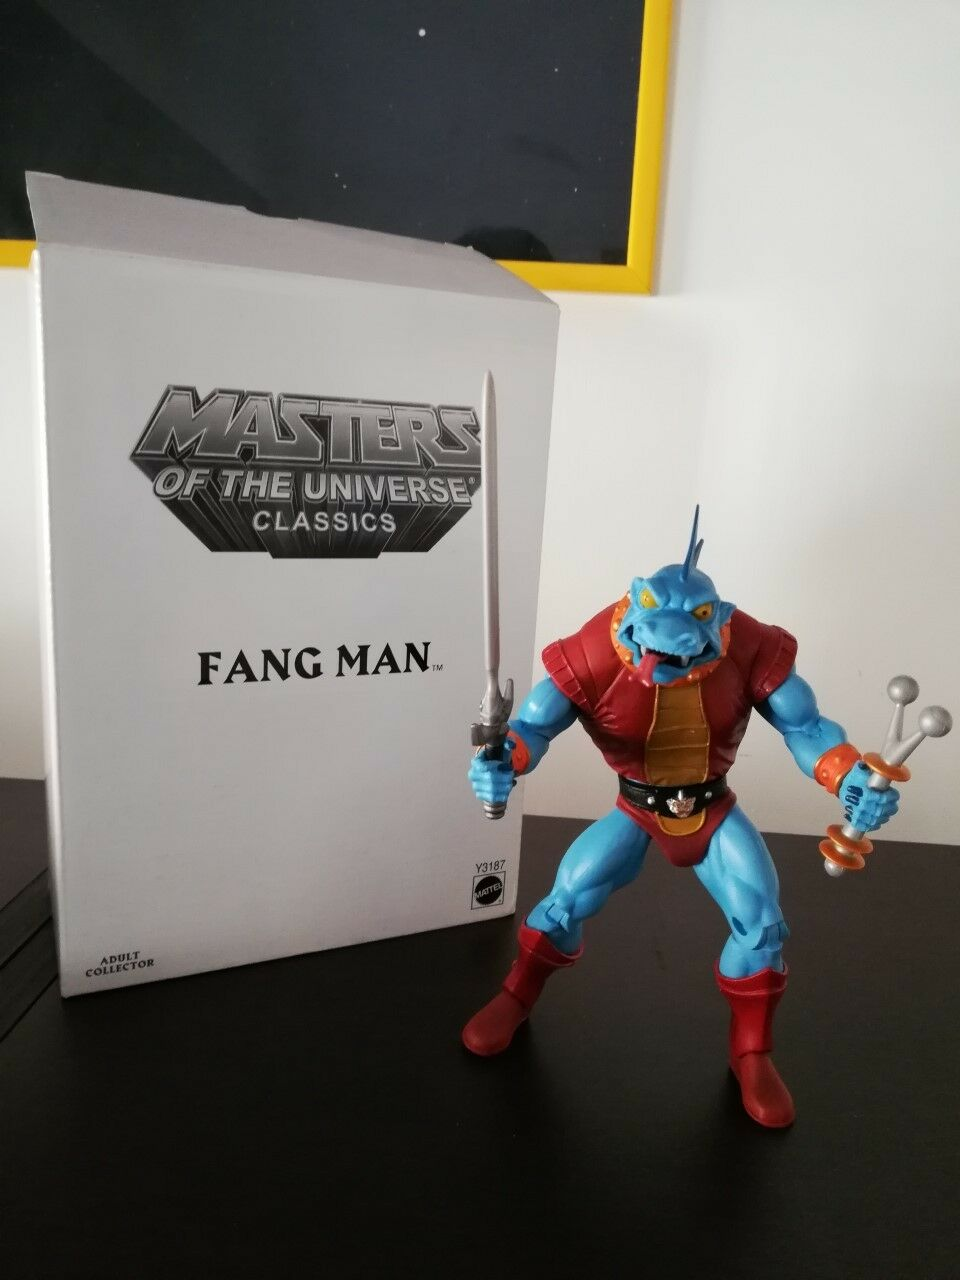 MOTUC FANG MAN LOOSE motuc Masters of the Universe MINT CONDITION + BOX